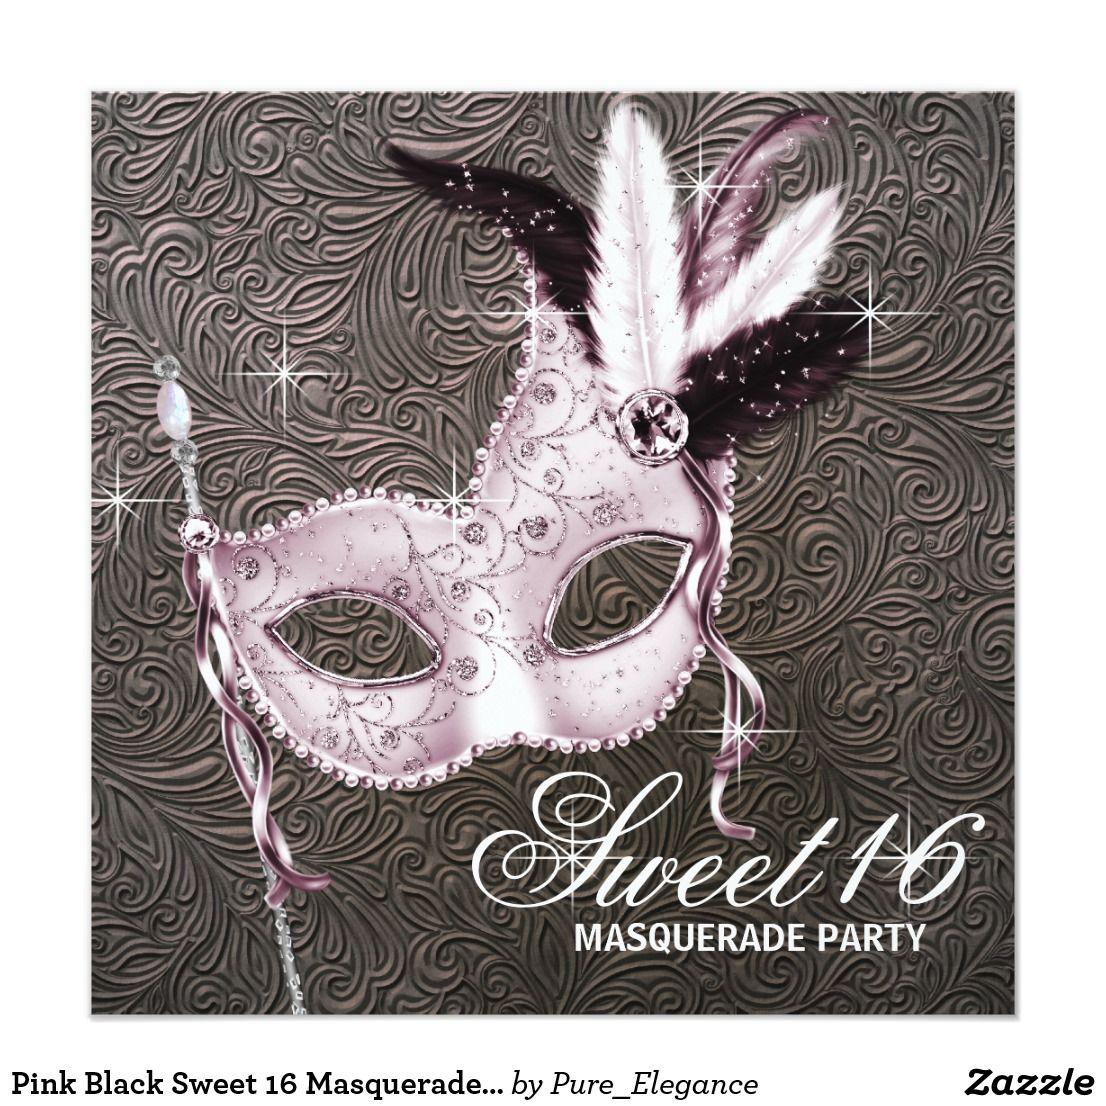 Pink black sweet 16 masquerade party card sweet 16 masquerade pink black sweet 16 masquerade party card filmwisefo